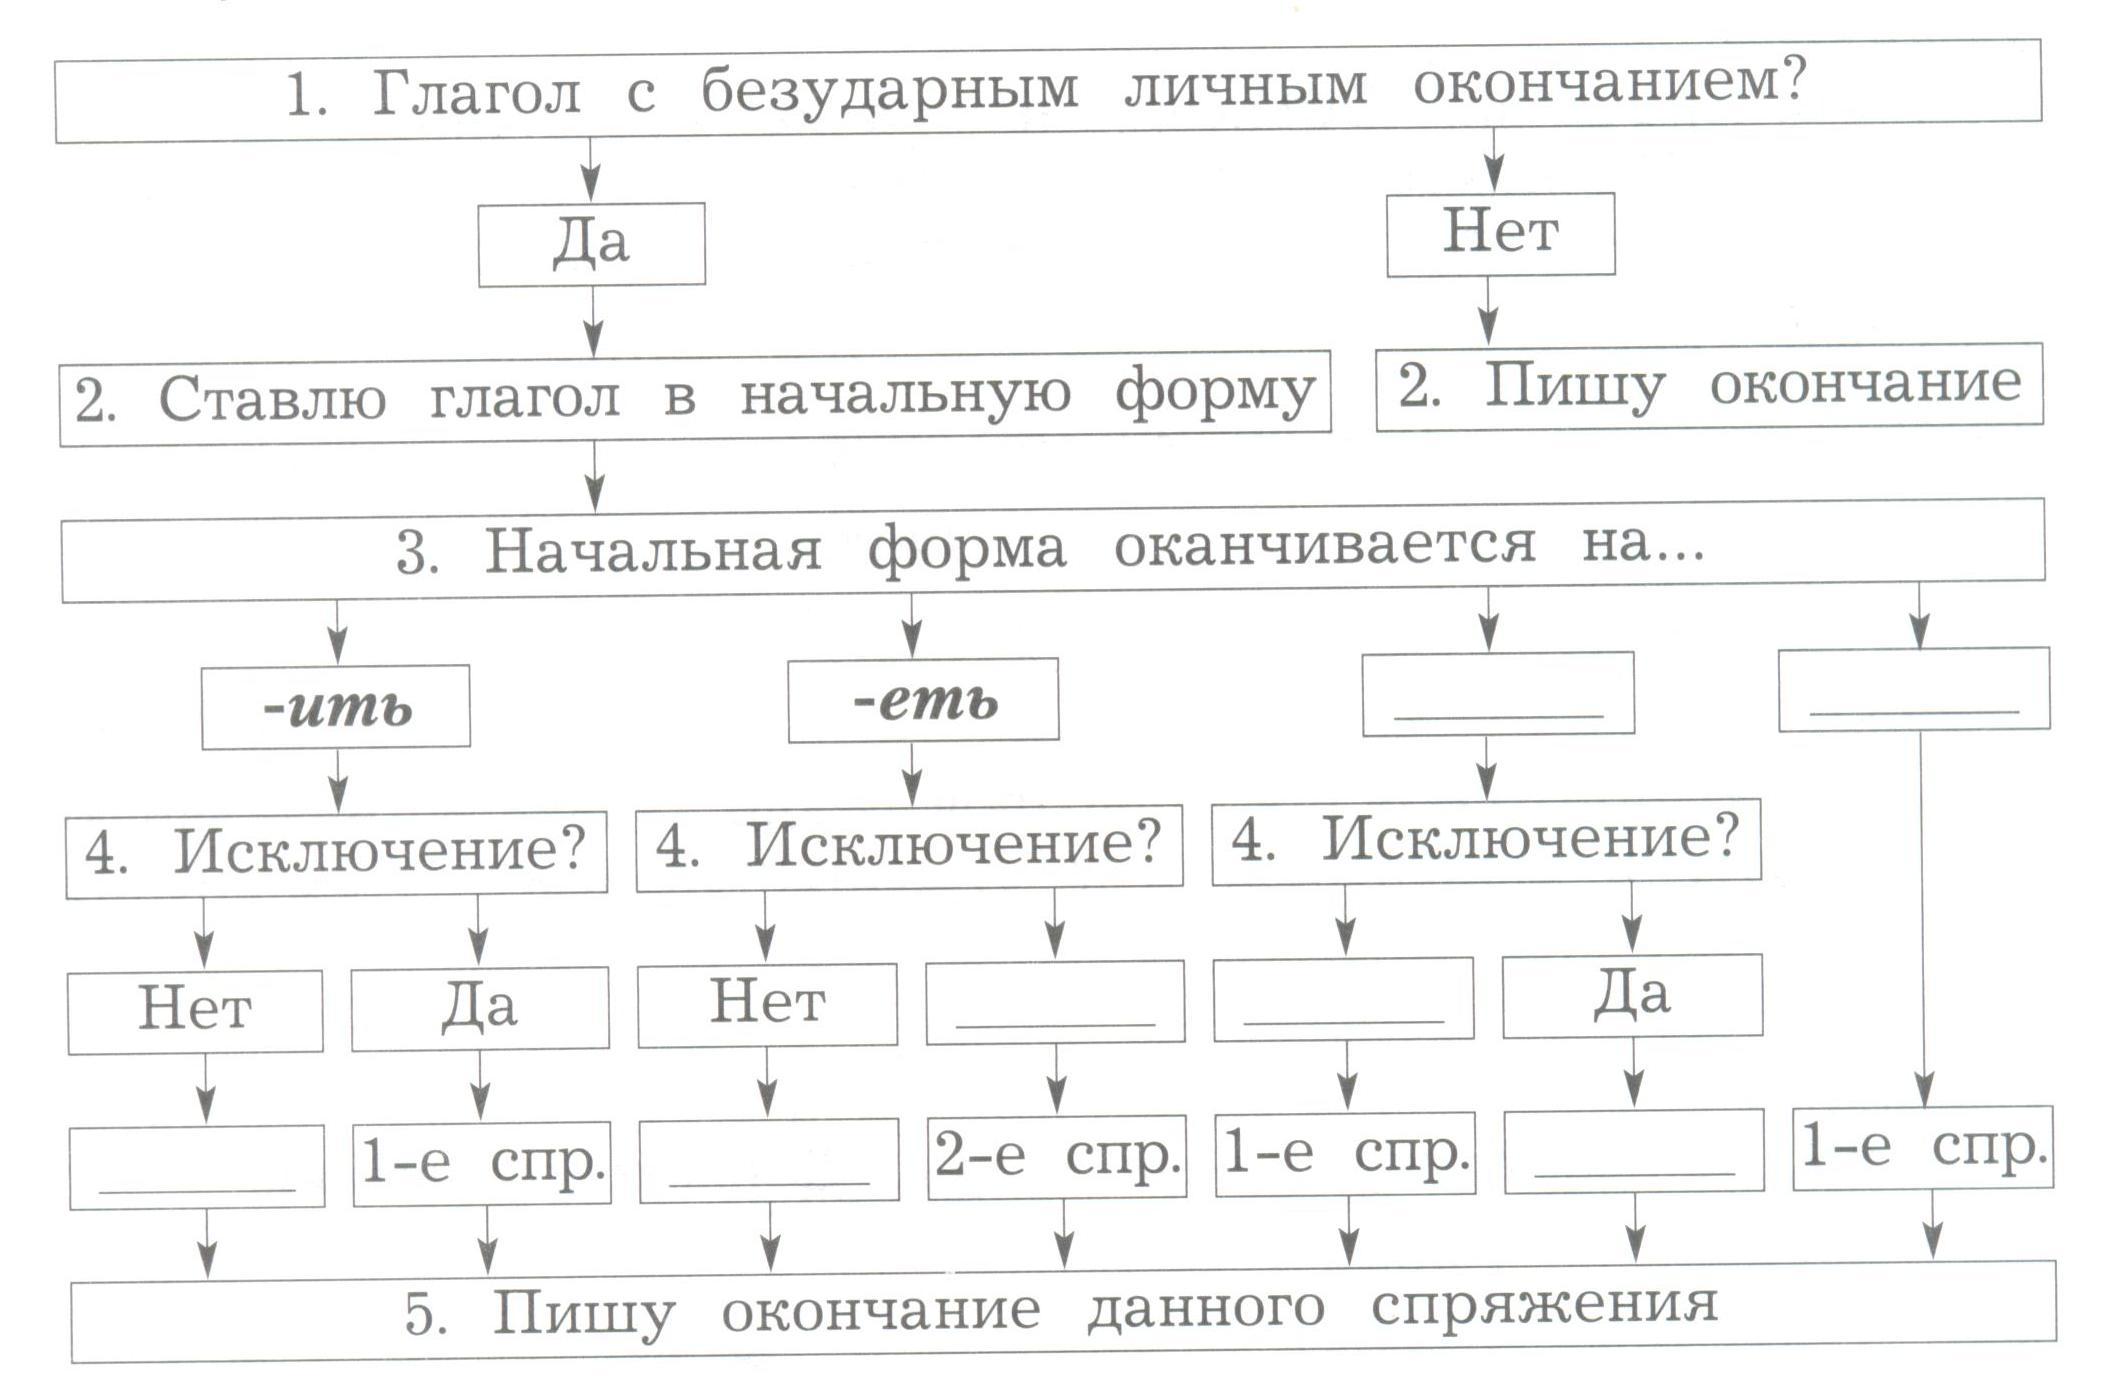 C:\Documents and Settings\1\Рабочий стол\Изображение 5267.jpg